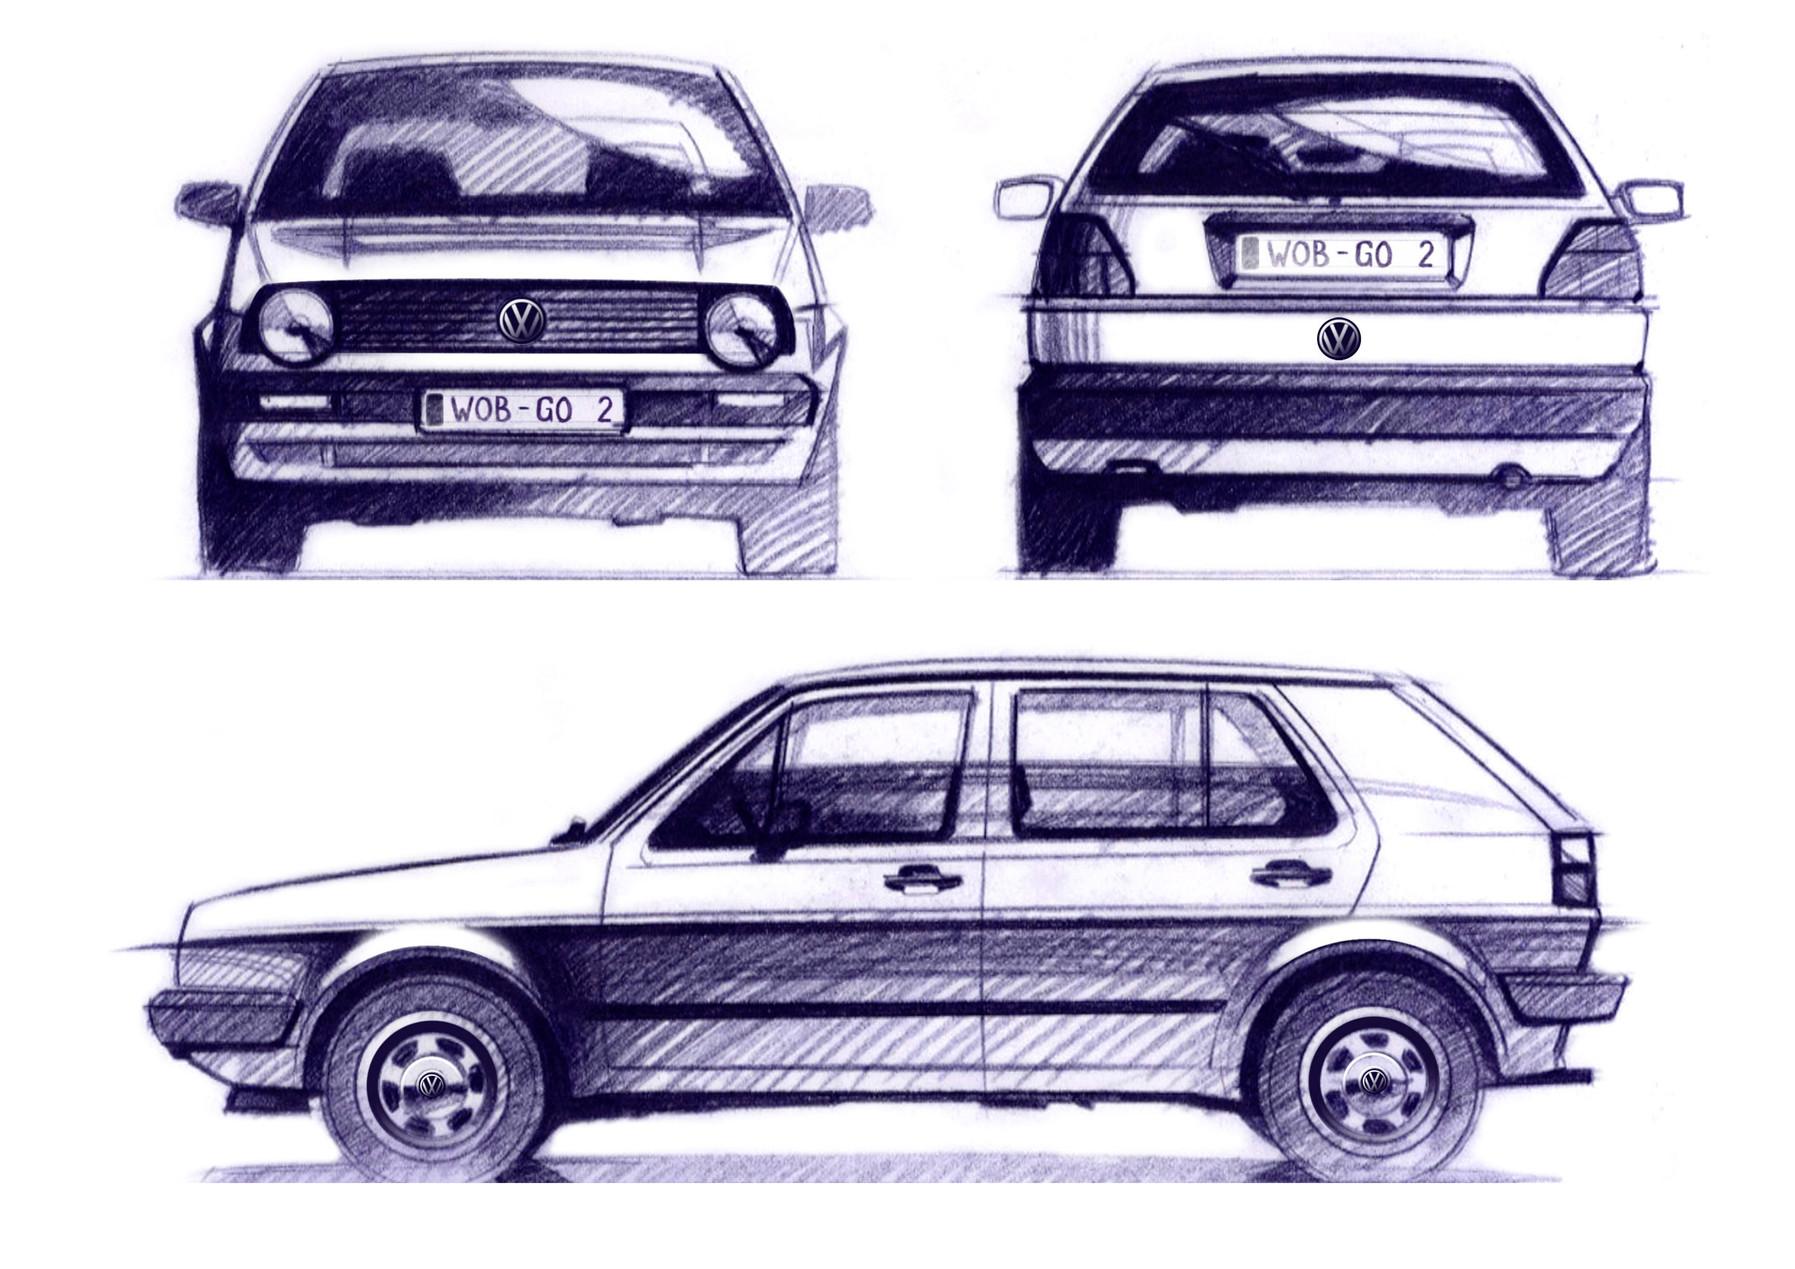 Audi-R8-production-MSS-2015-468